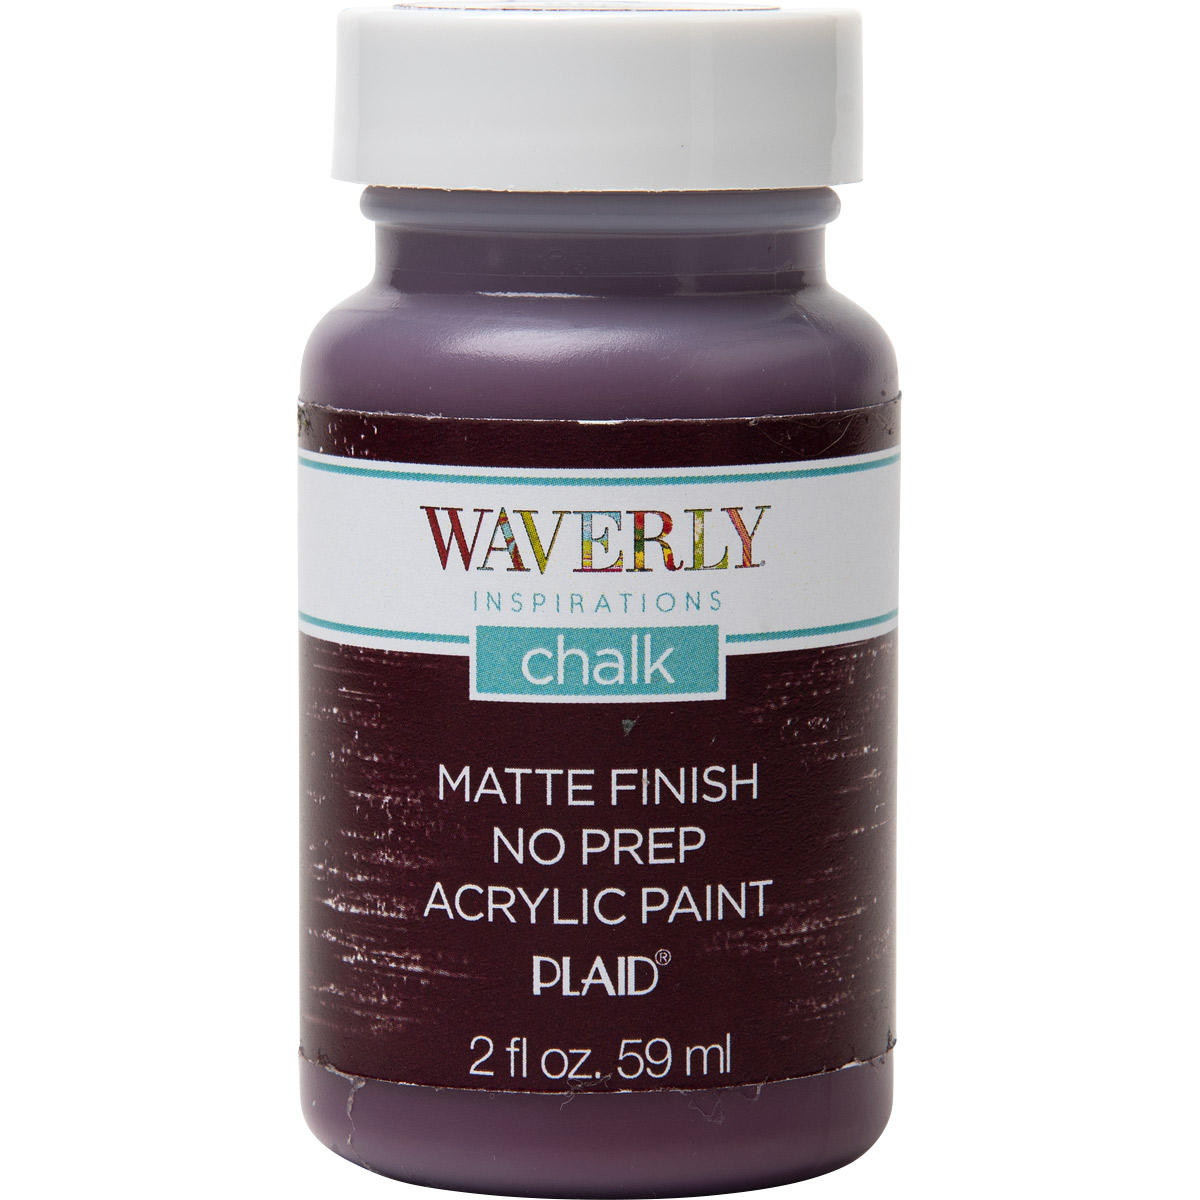 Waverly ® Inspirations Chalk Finish Acrylic Paint - Merlot, 2 oz. - 44630E